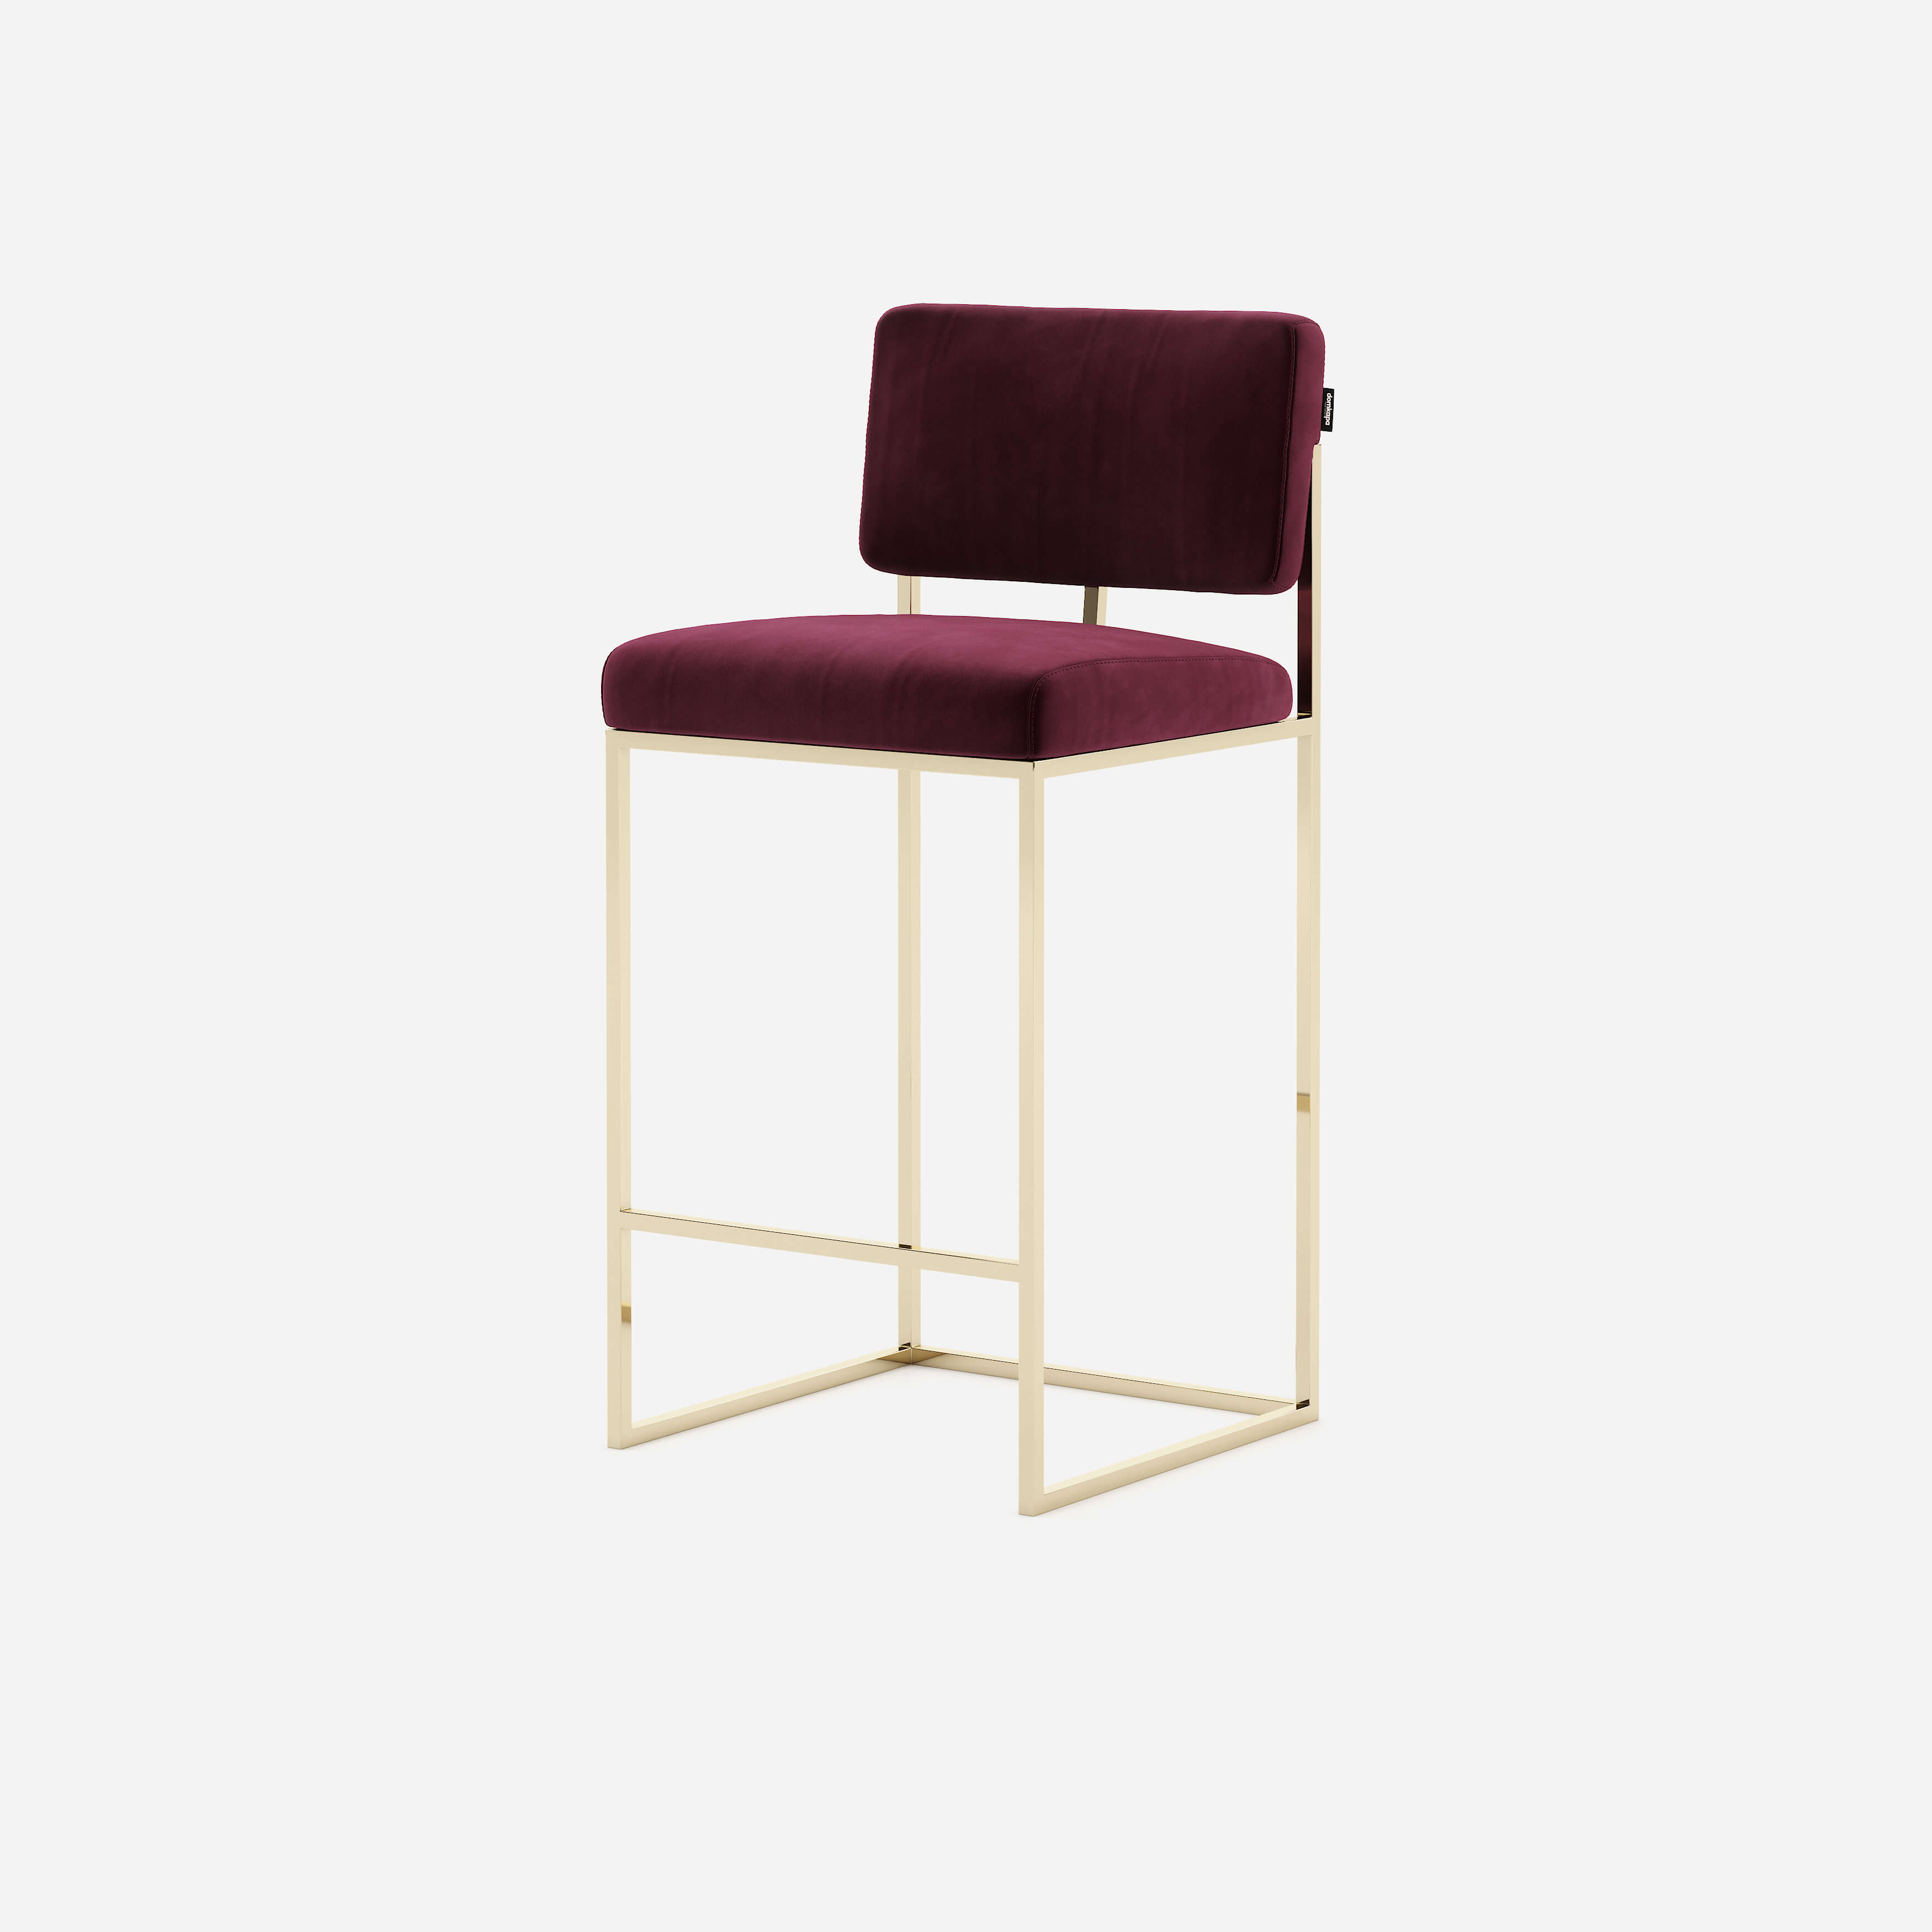 gram-counter-chair-bar-restaurant-projects-contract-hospitality-interior-design-velvet-bordeaux-steel-gold-domkapa-1